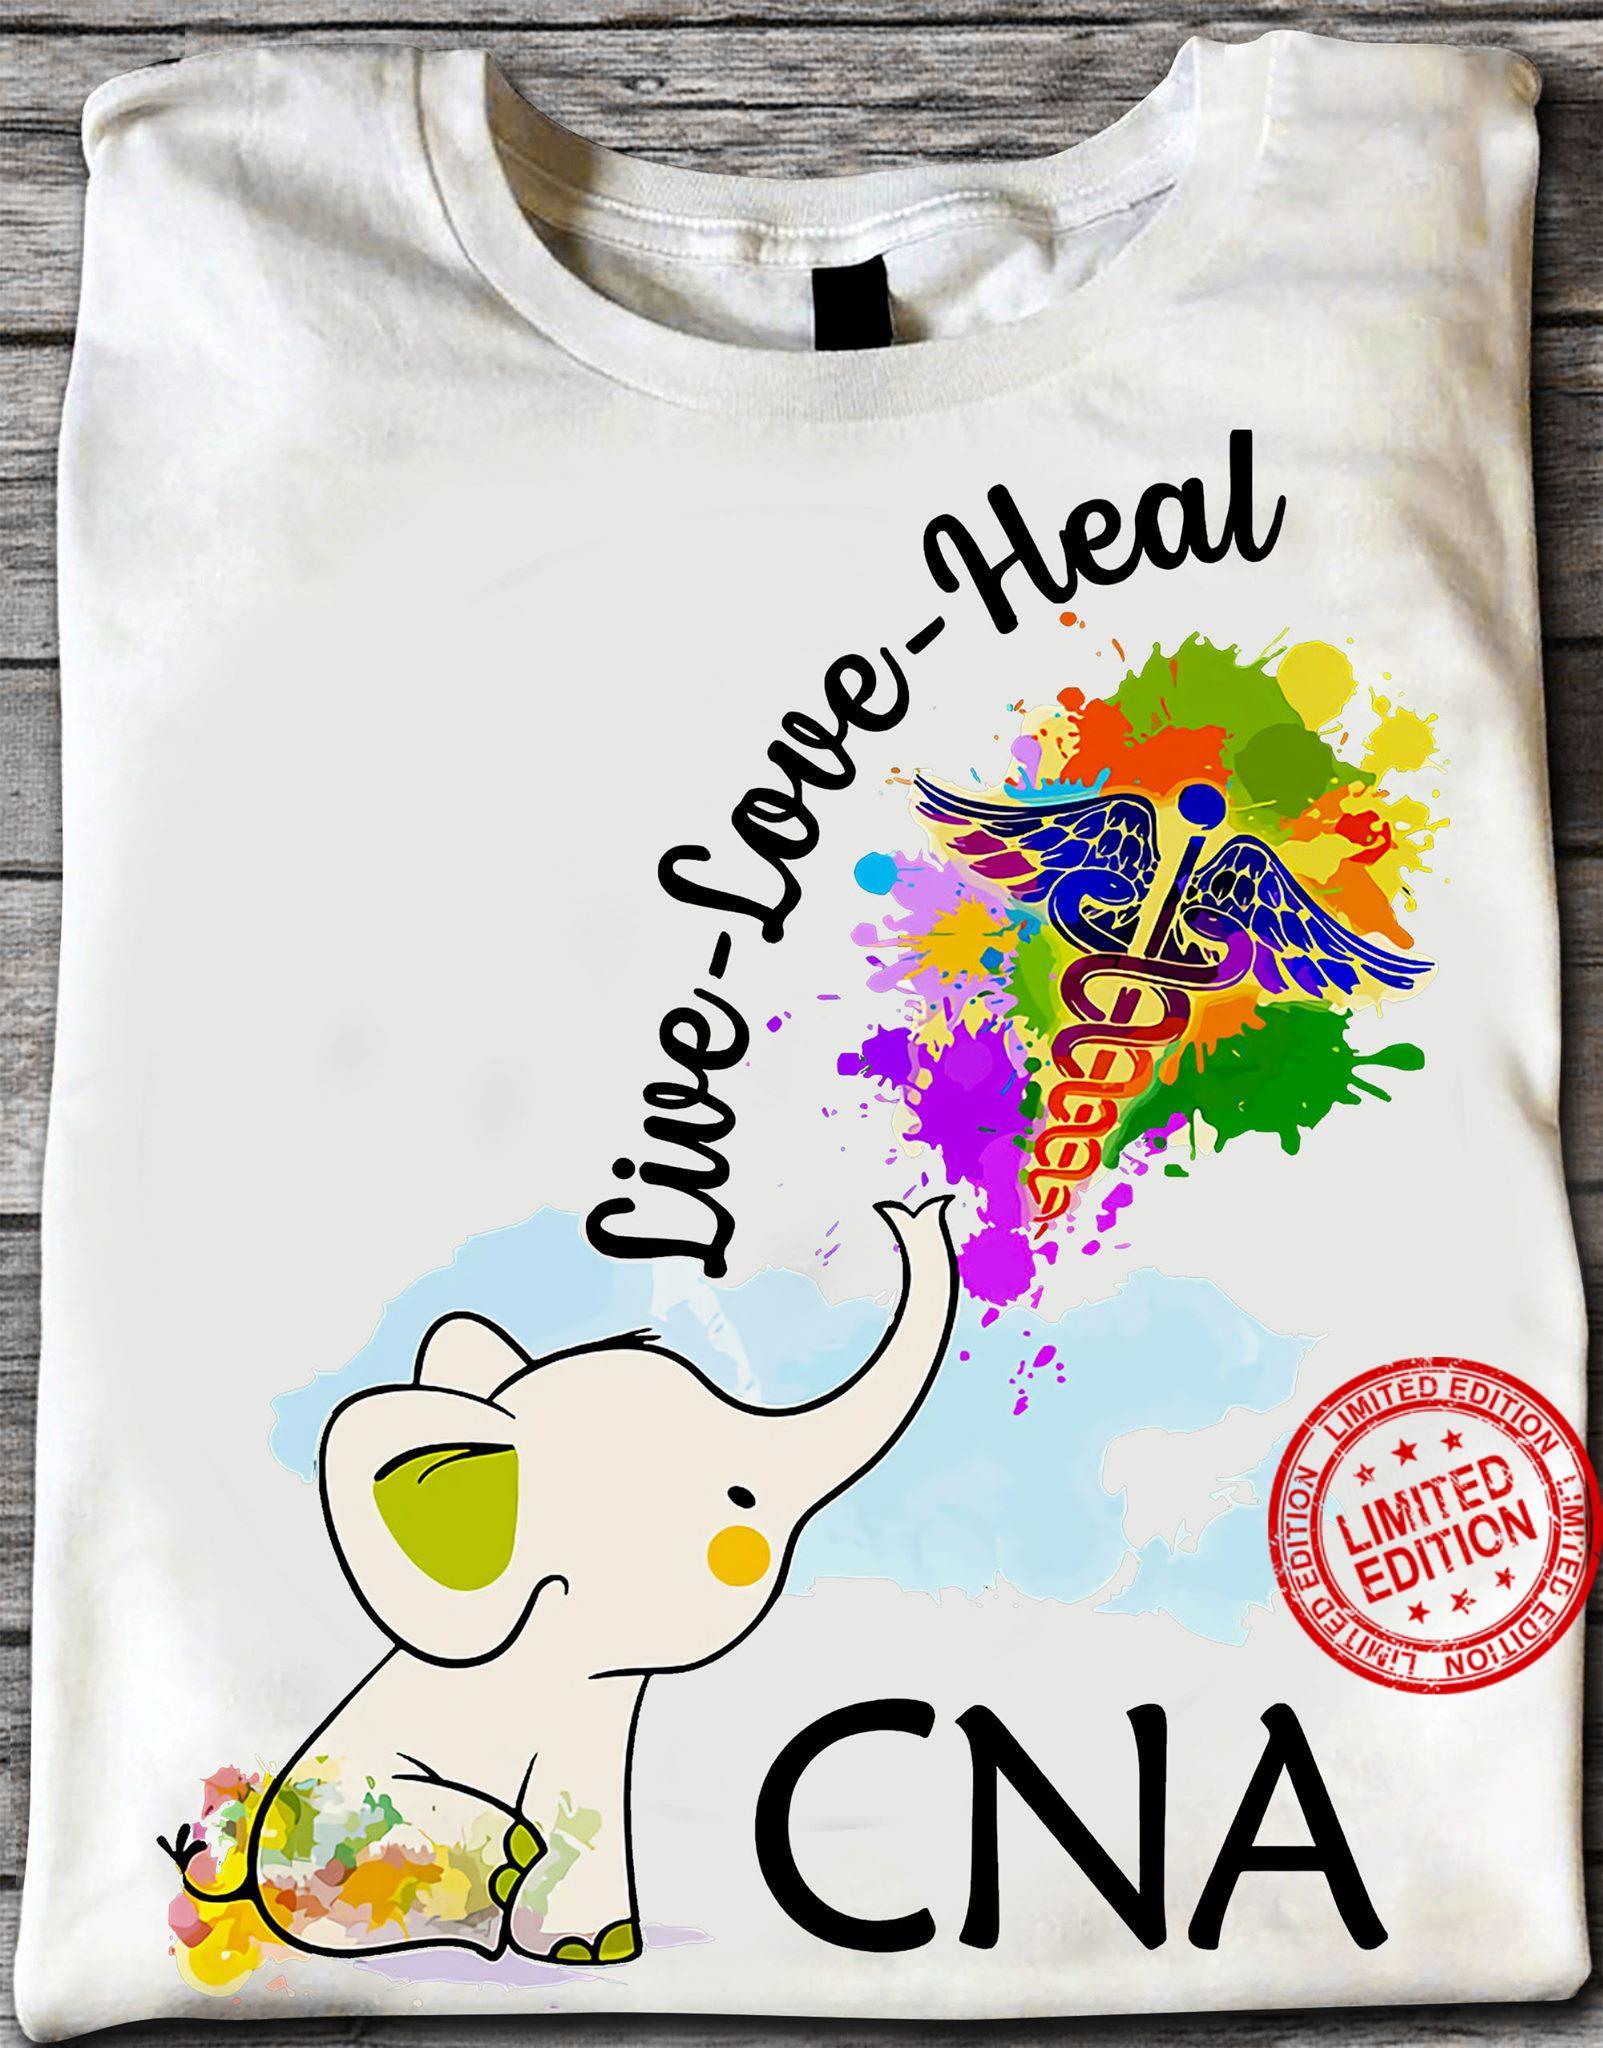 Live Love Heal CNA Shirt